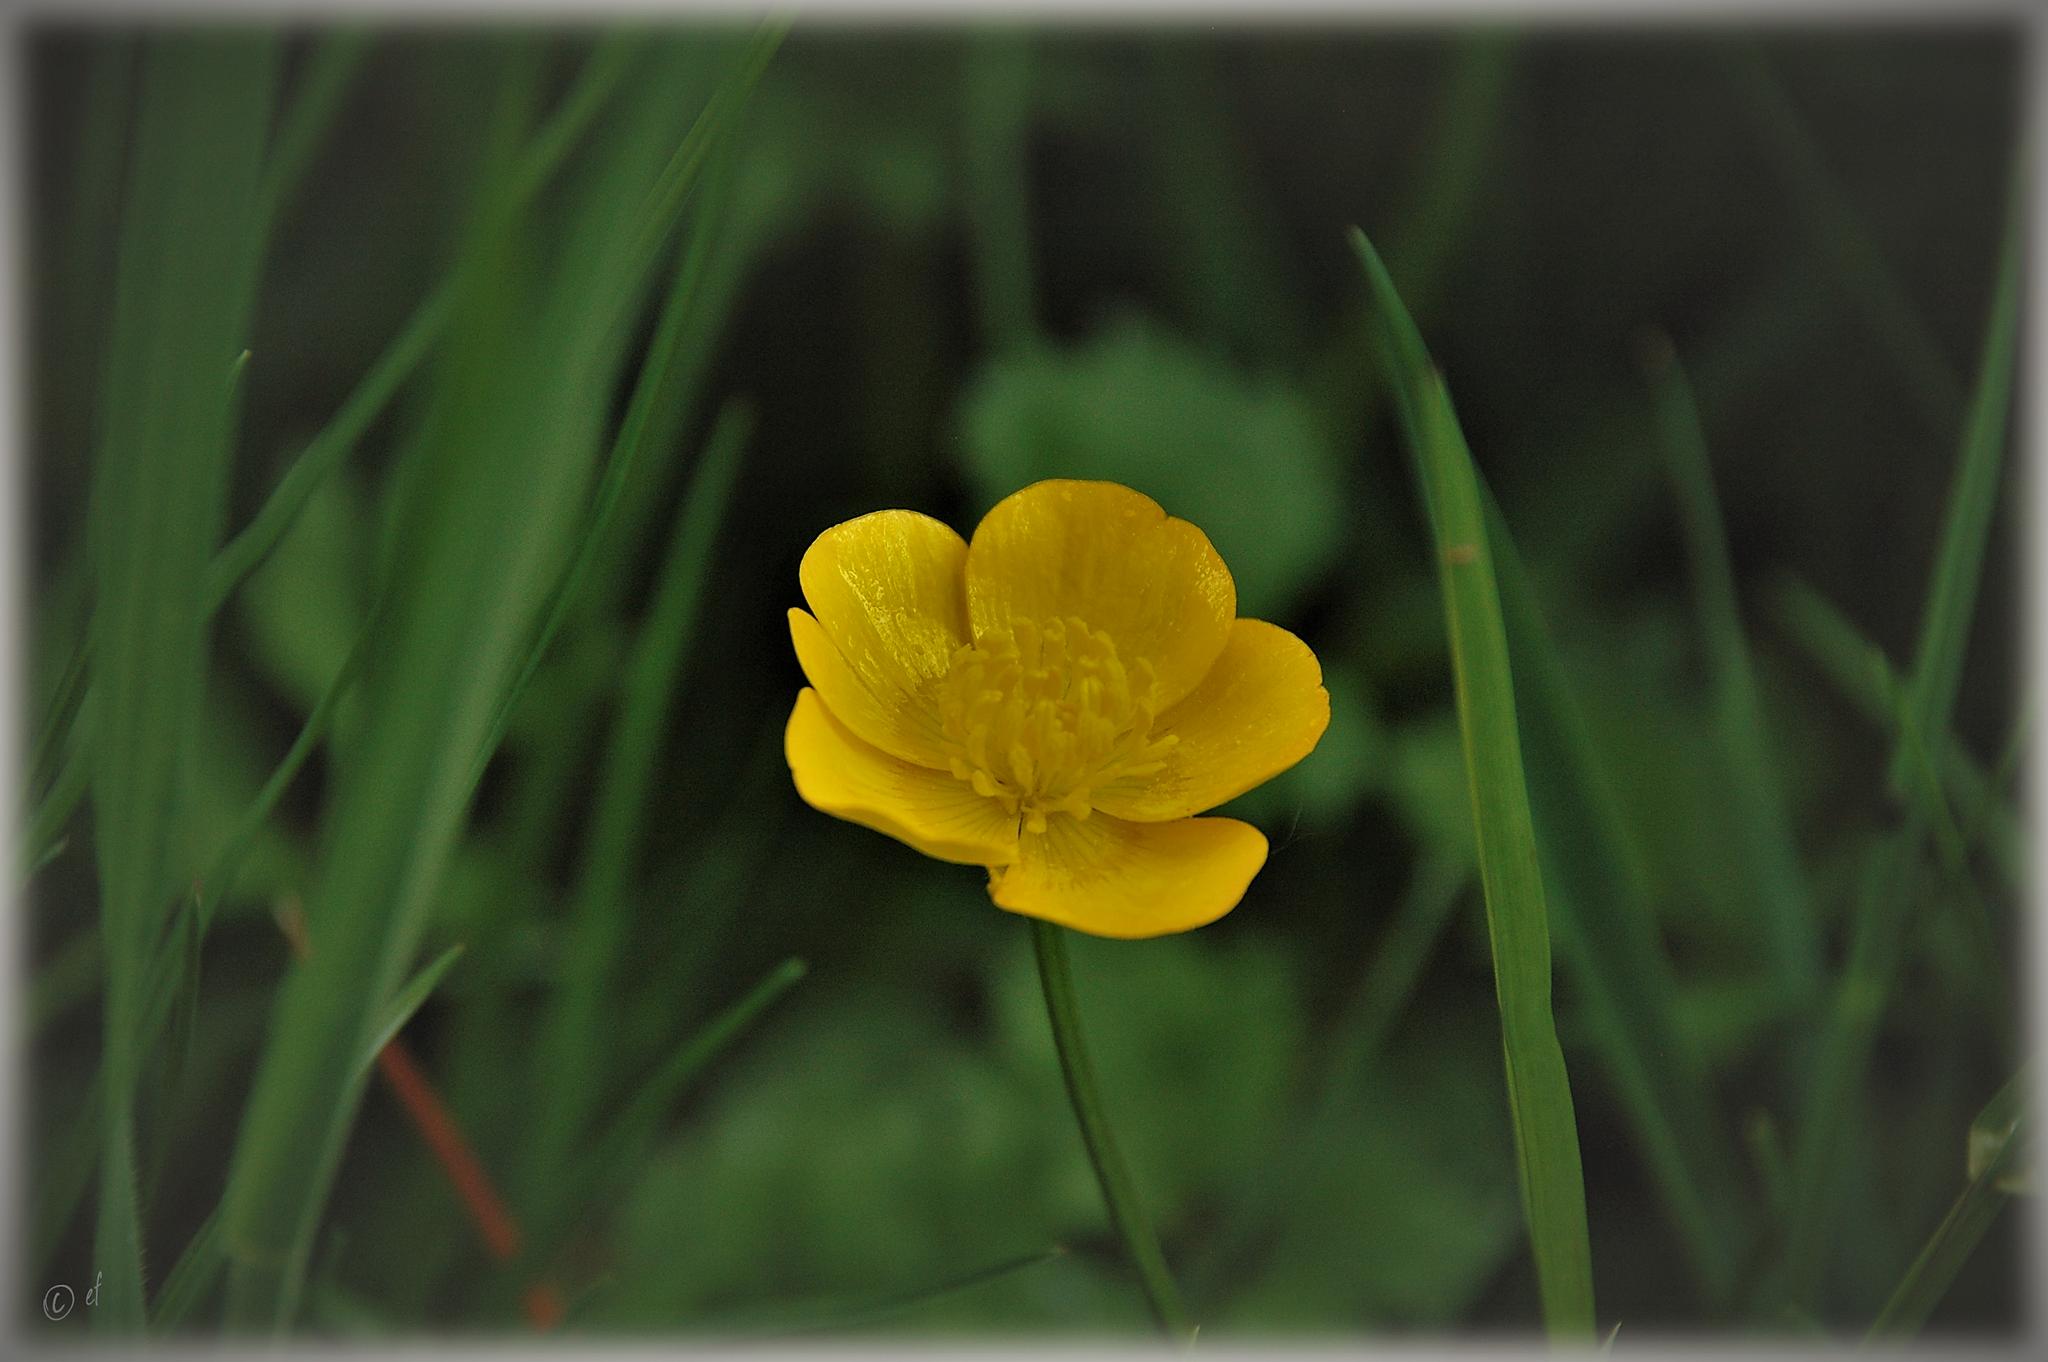 Der gelbe Blütenglanz